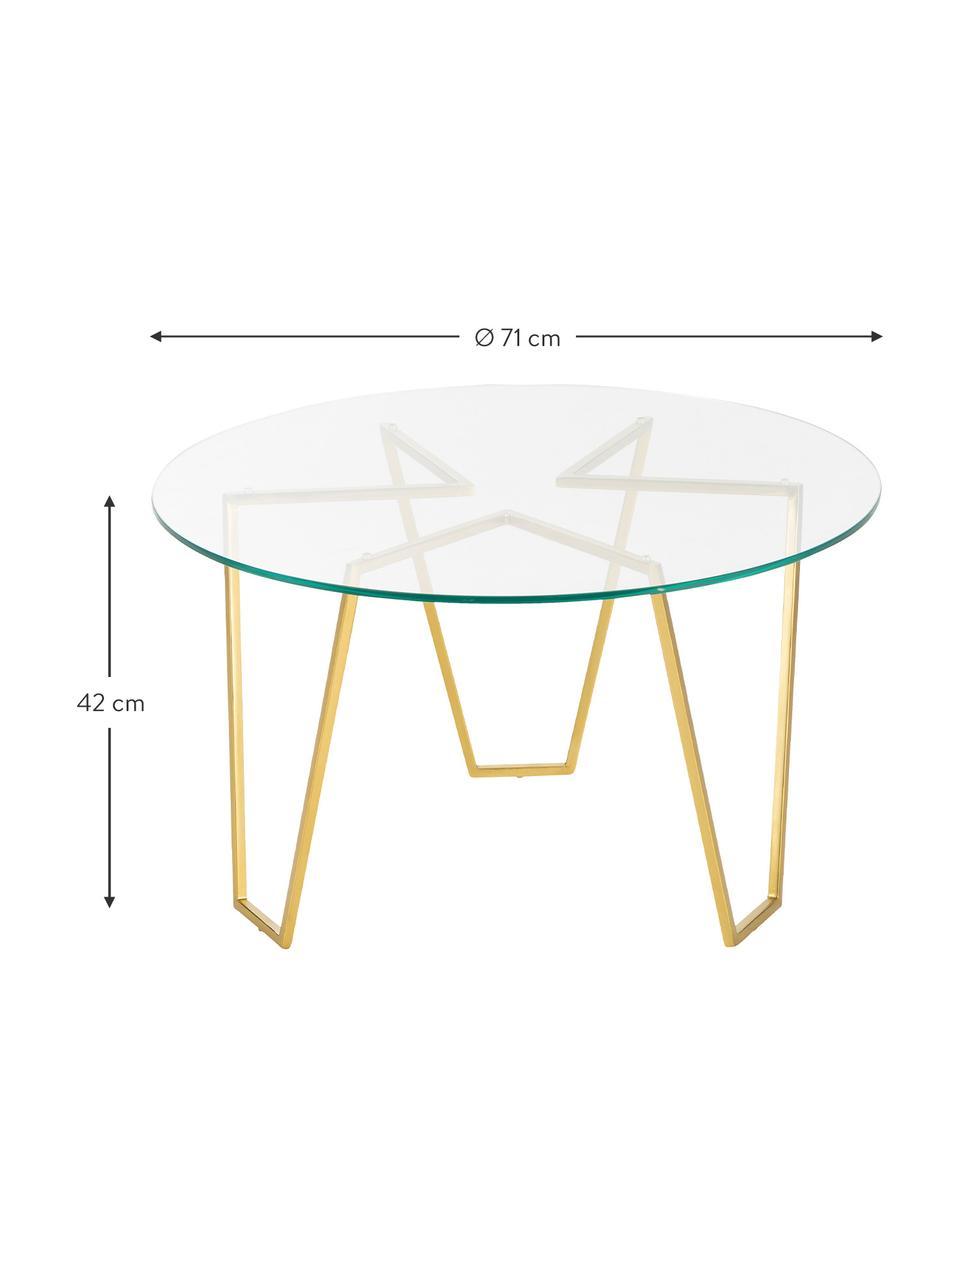 Ronde salontafel Scarlett met glazen tafelblad, Frame: vermessingd metaal, Tafelblad: veiligheidsglas, Frame: bronskleurig. Tafelblad: transparant, Ø 71 x H 42 cm